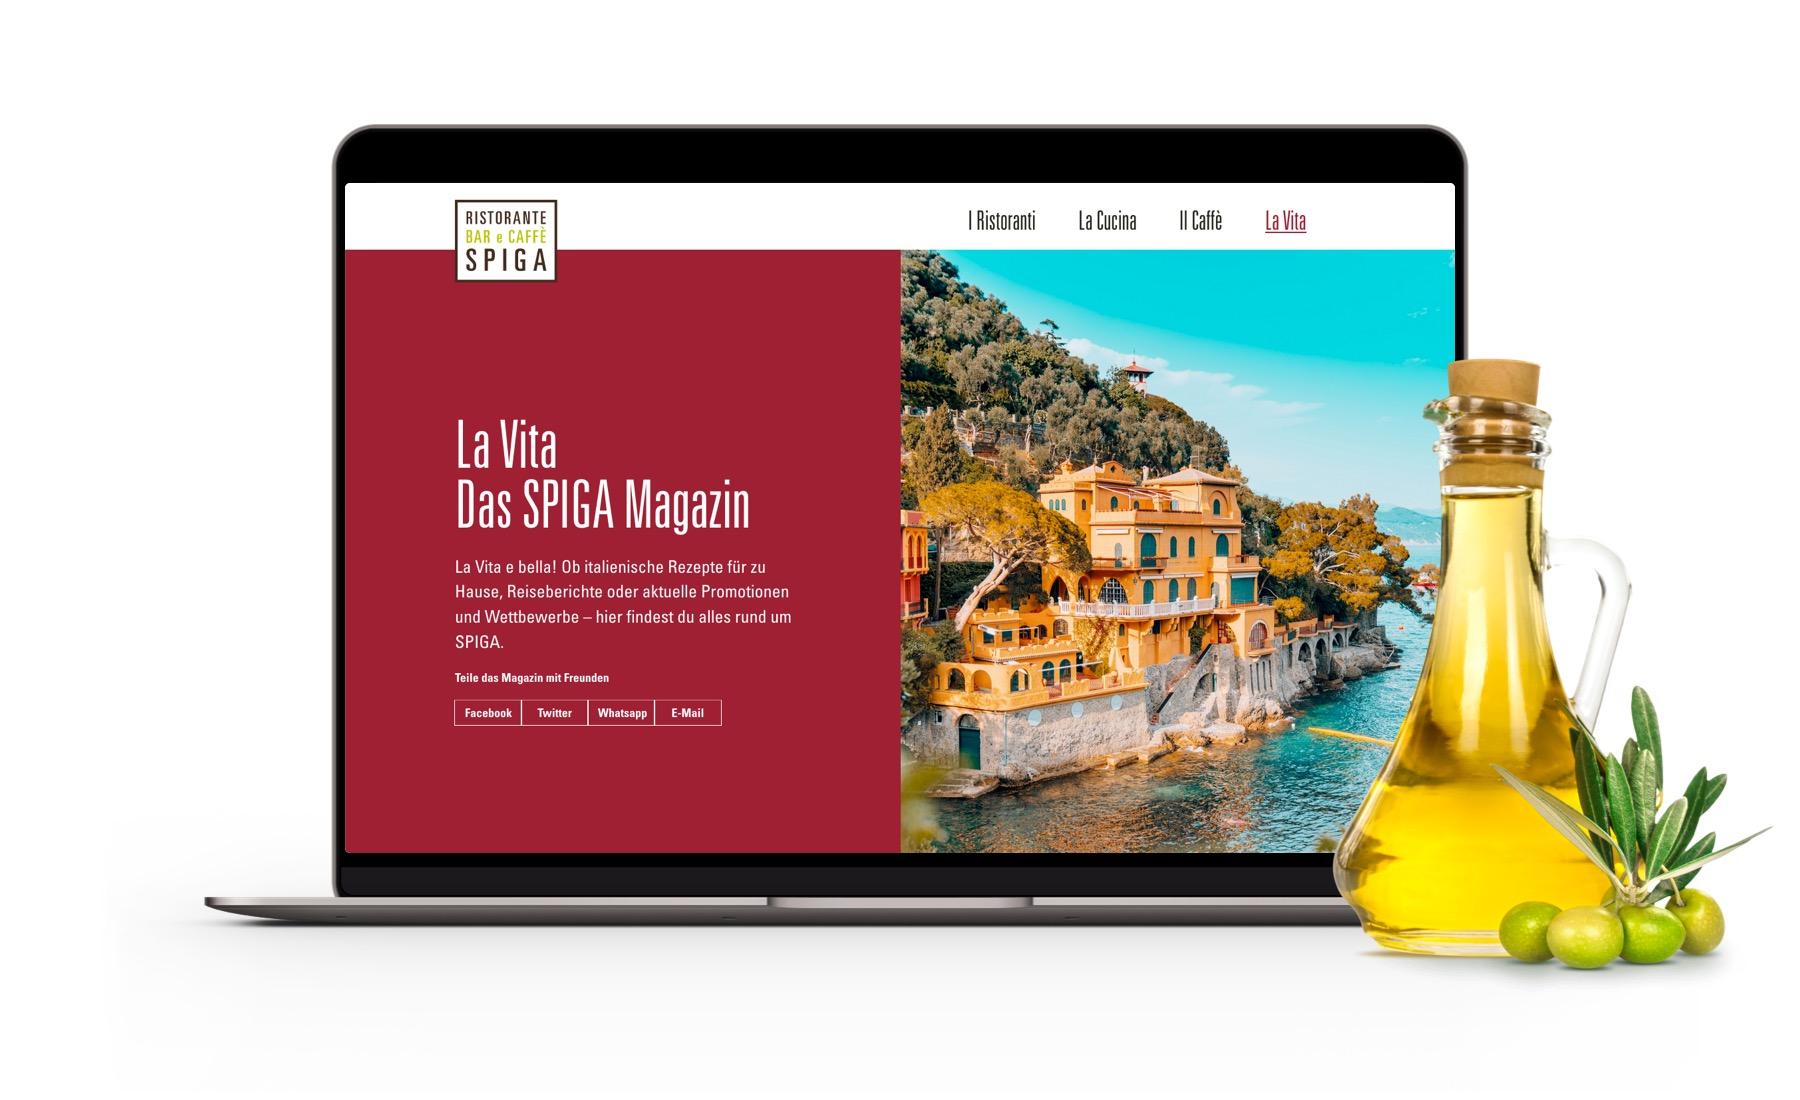 spiga-web-slider-macbook-3